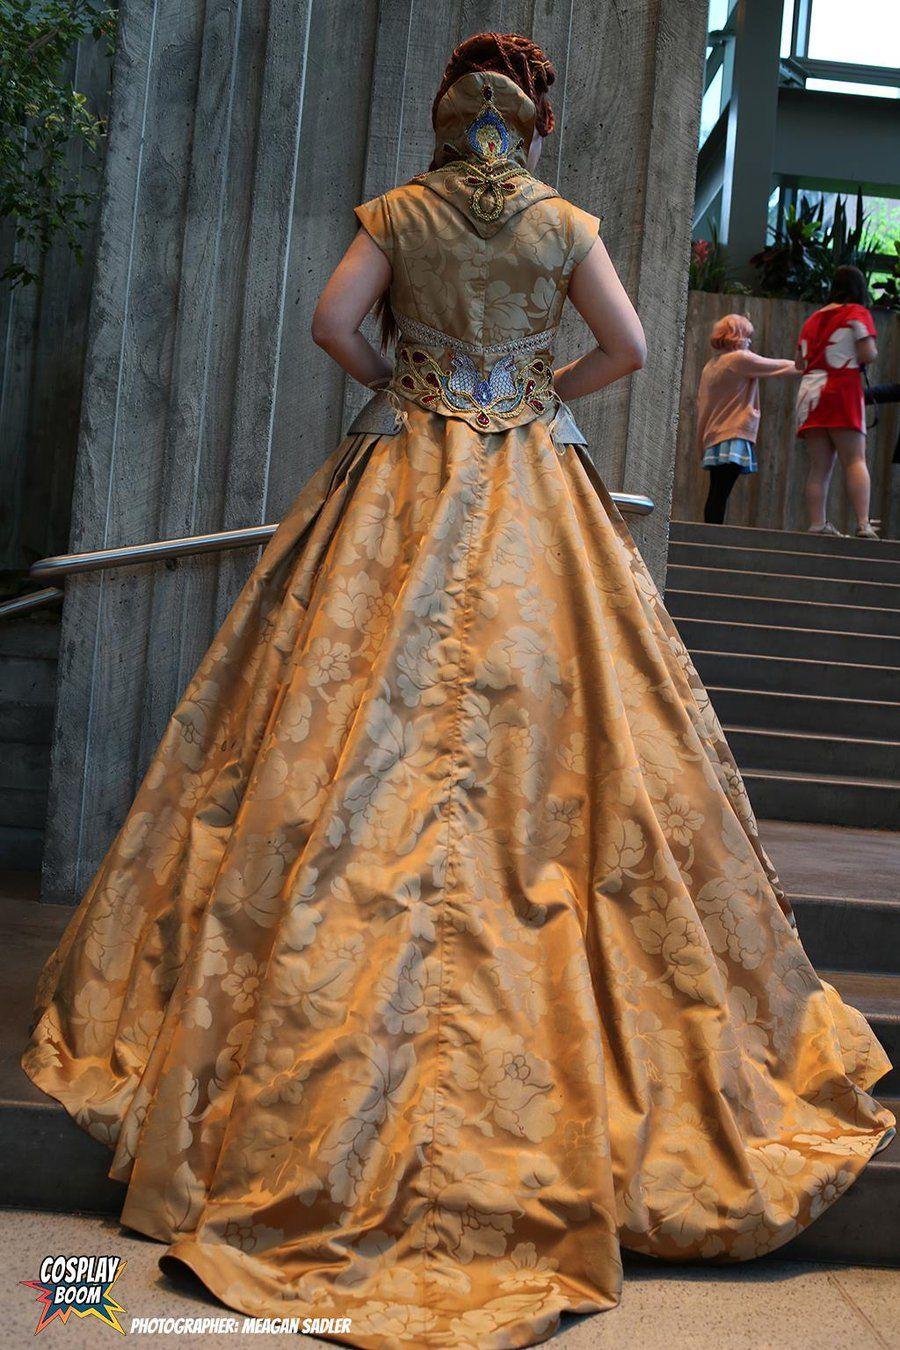 Game Of Thrones Sansa Stark Wedding Gown Cosplay